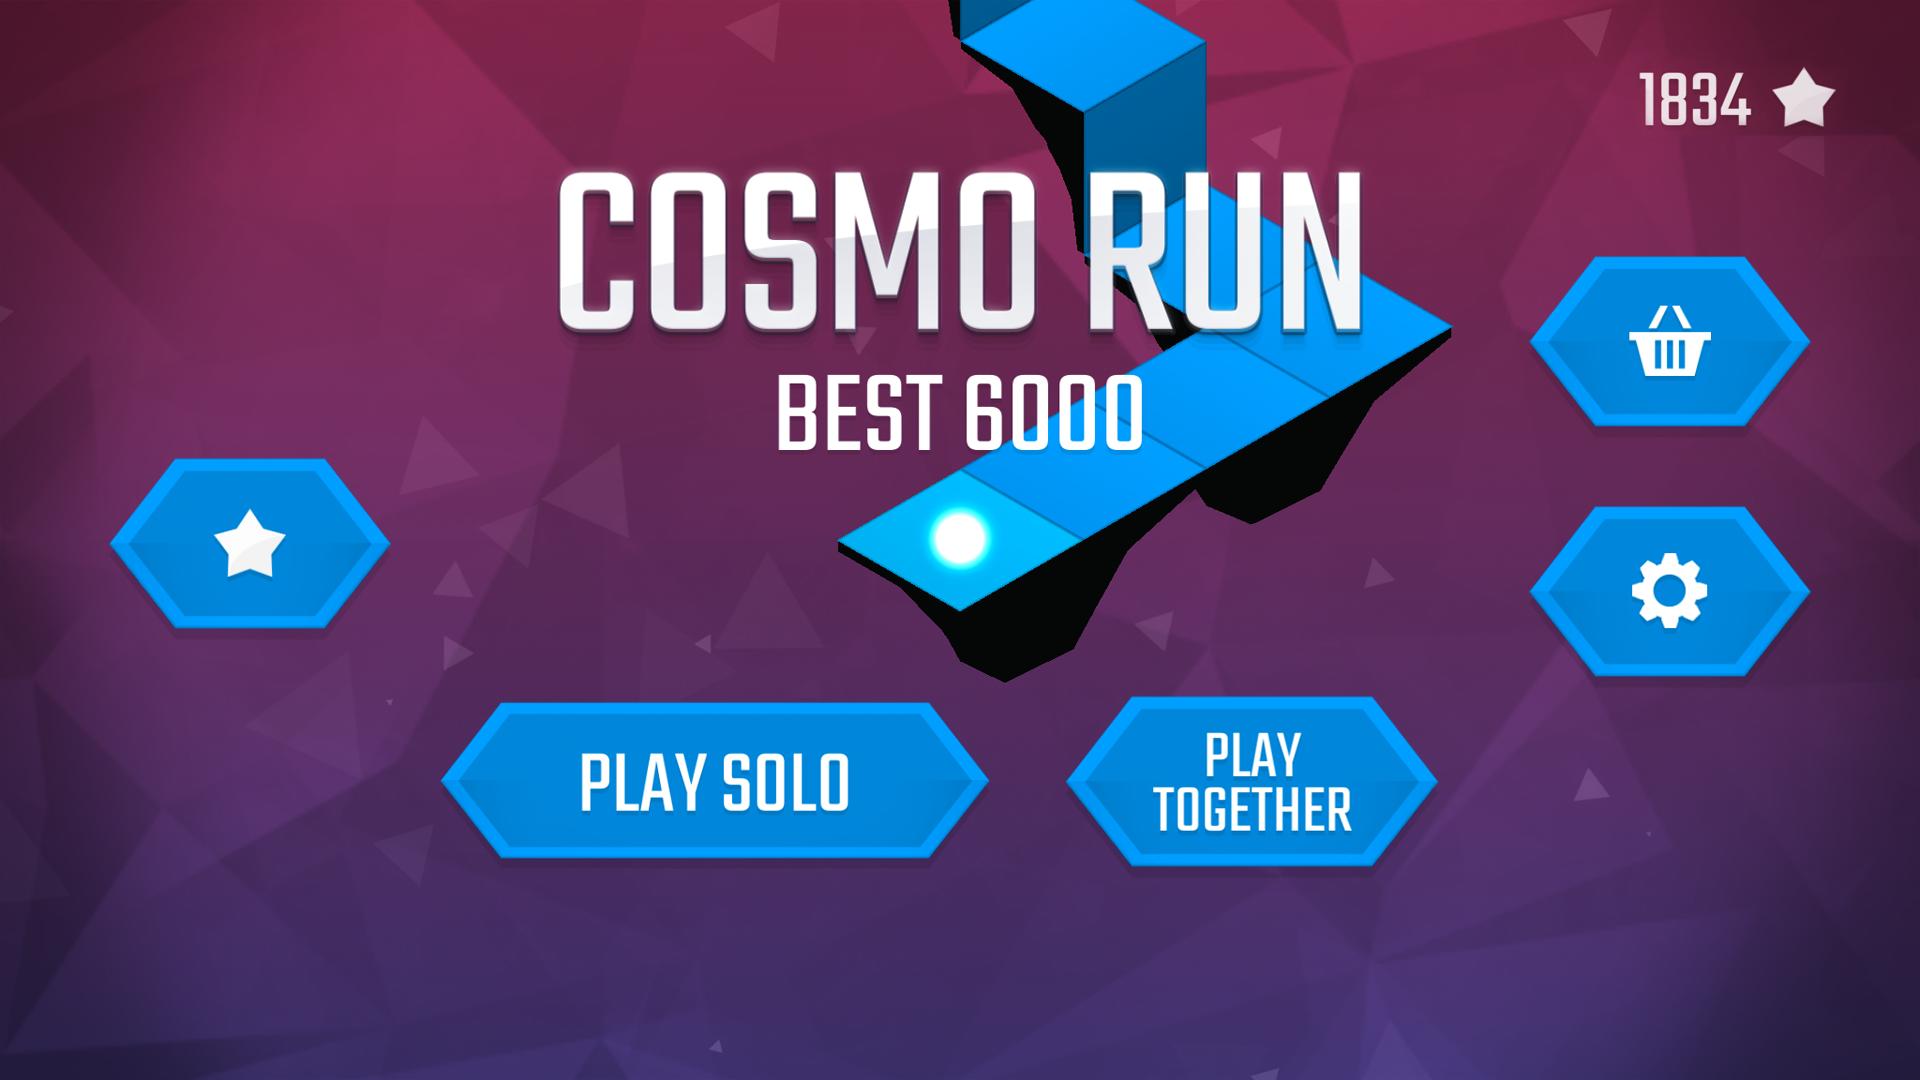 Cosmo Run, jogo de Xbox agora disponível na loja do Windows 10 PC e Mobile